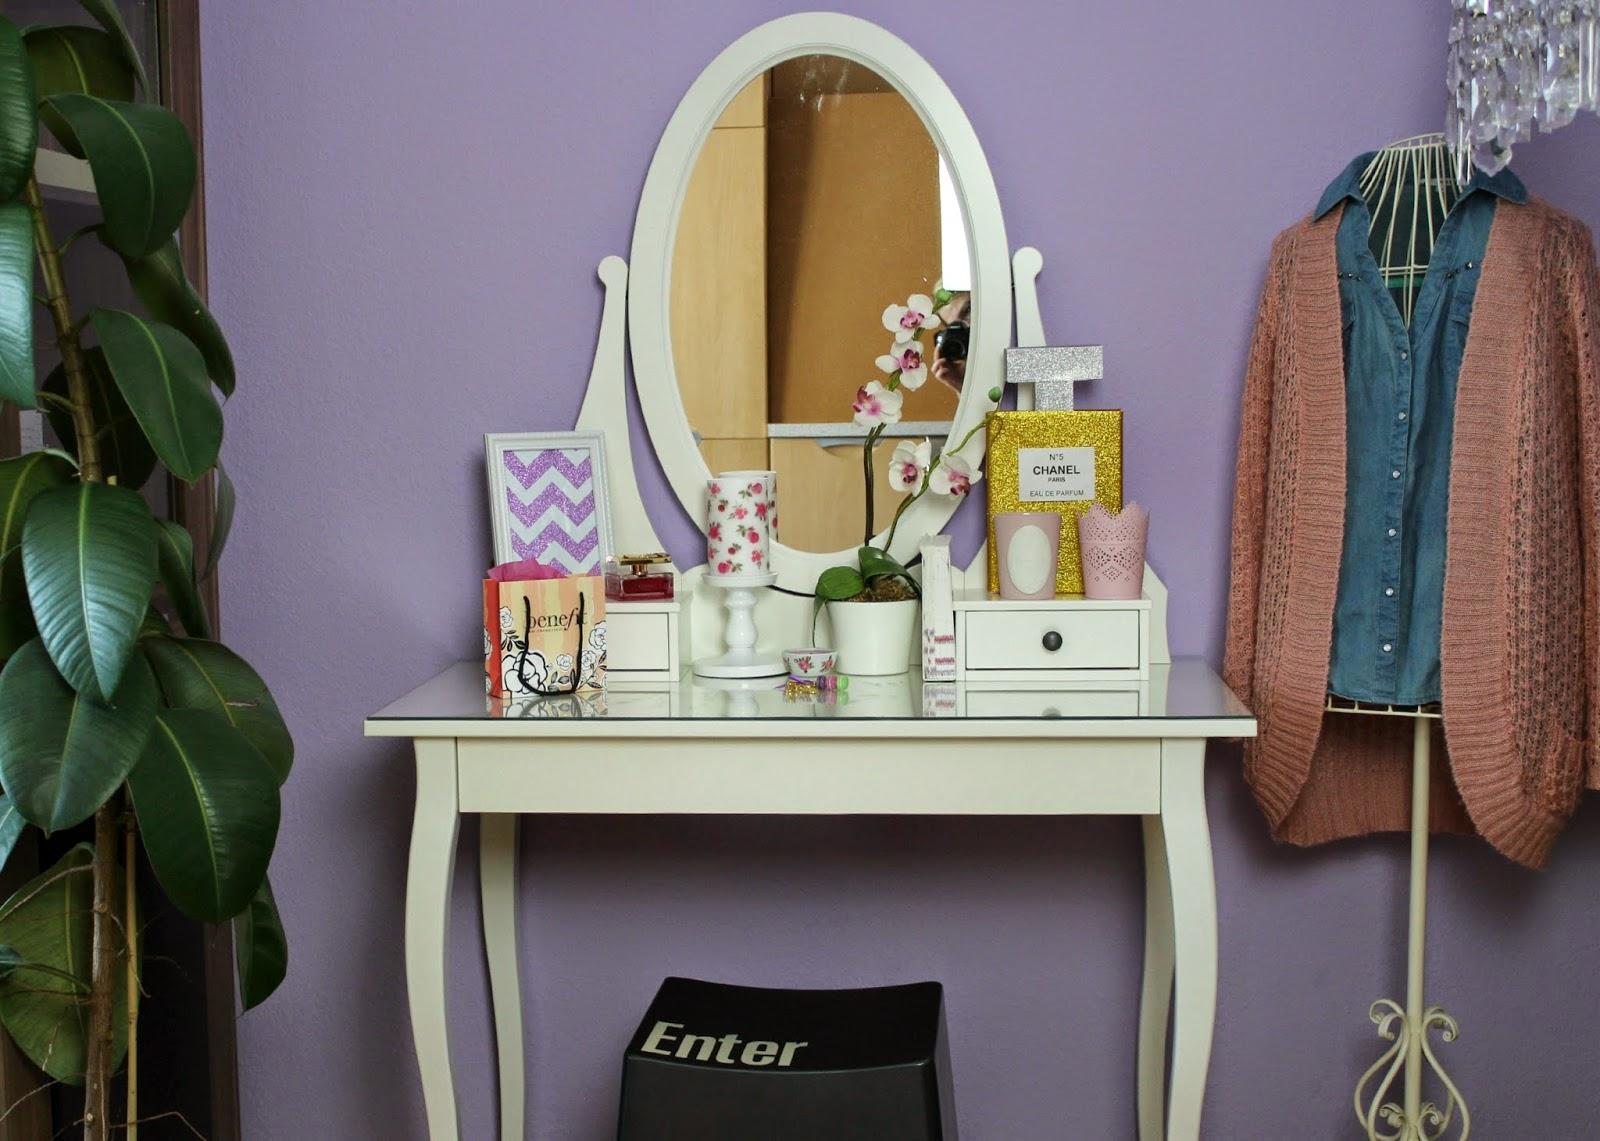 Schminktisch Ikea Hemnes Gebraucht ~   ikea hemnes frisiertisch ikea family angebot blogger schminktisch jpg